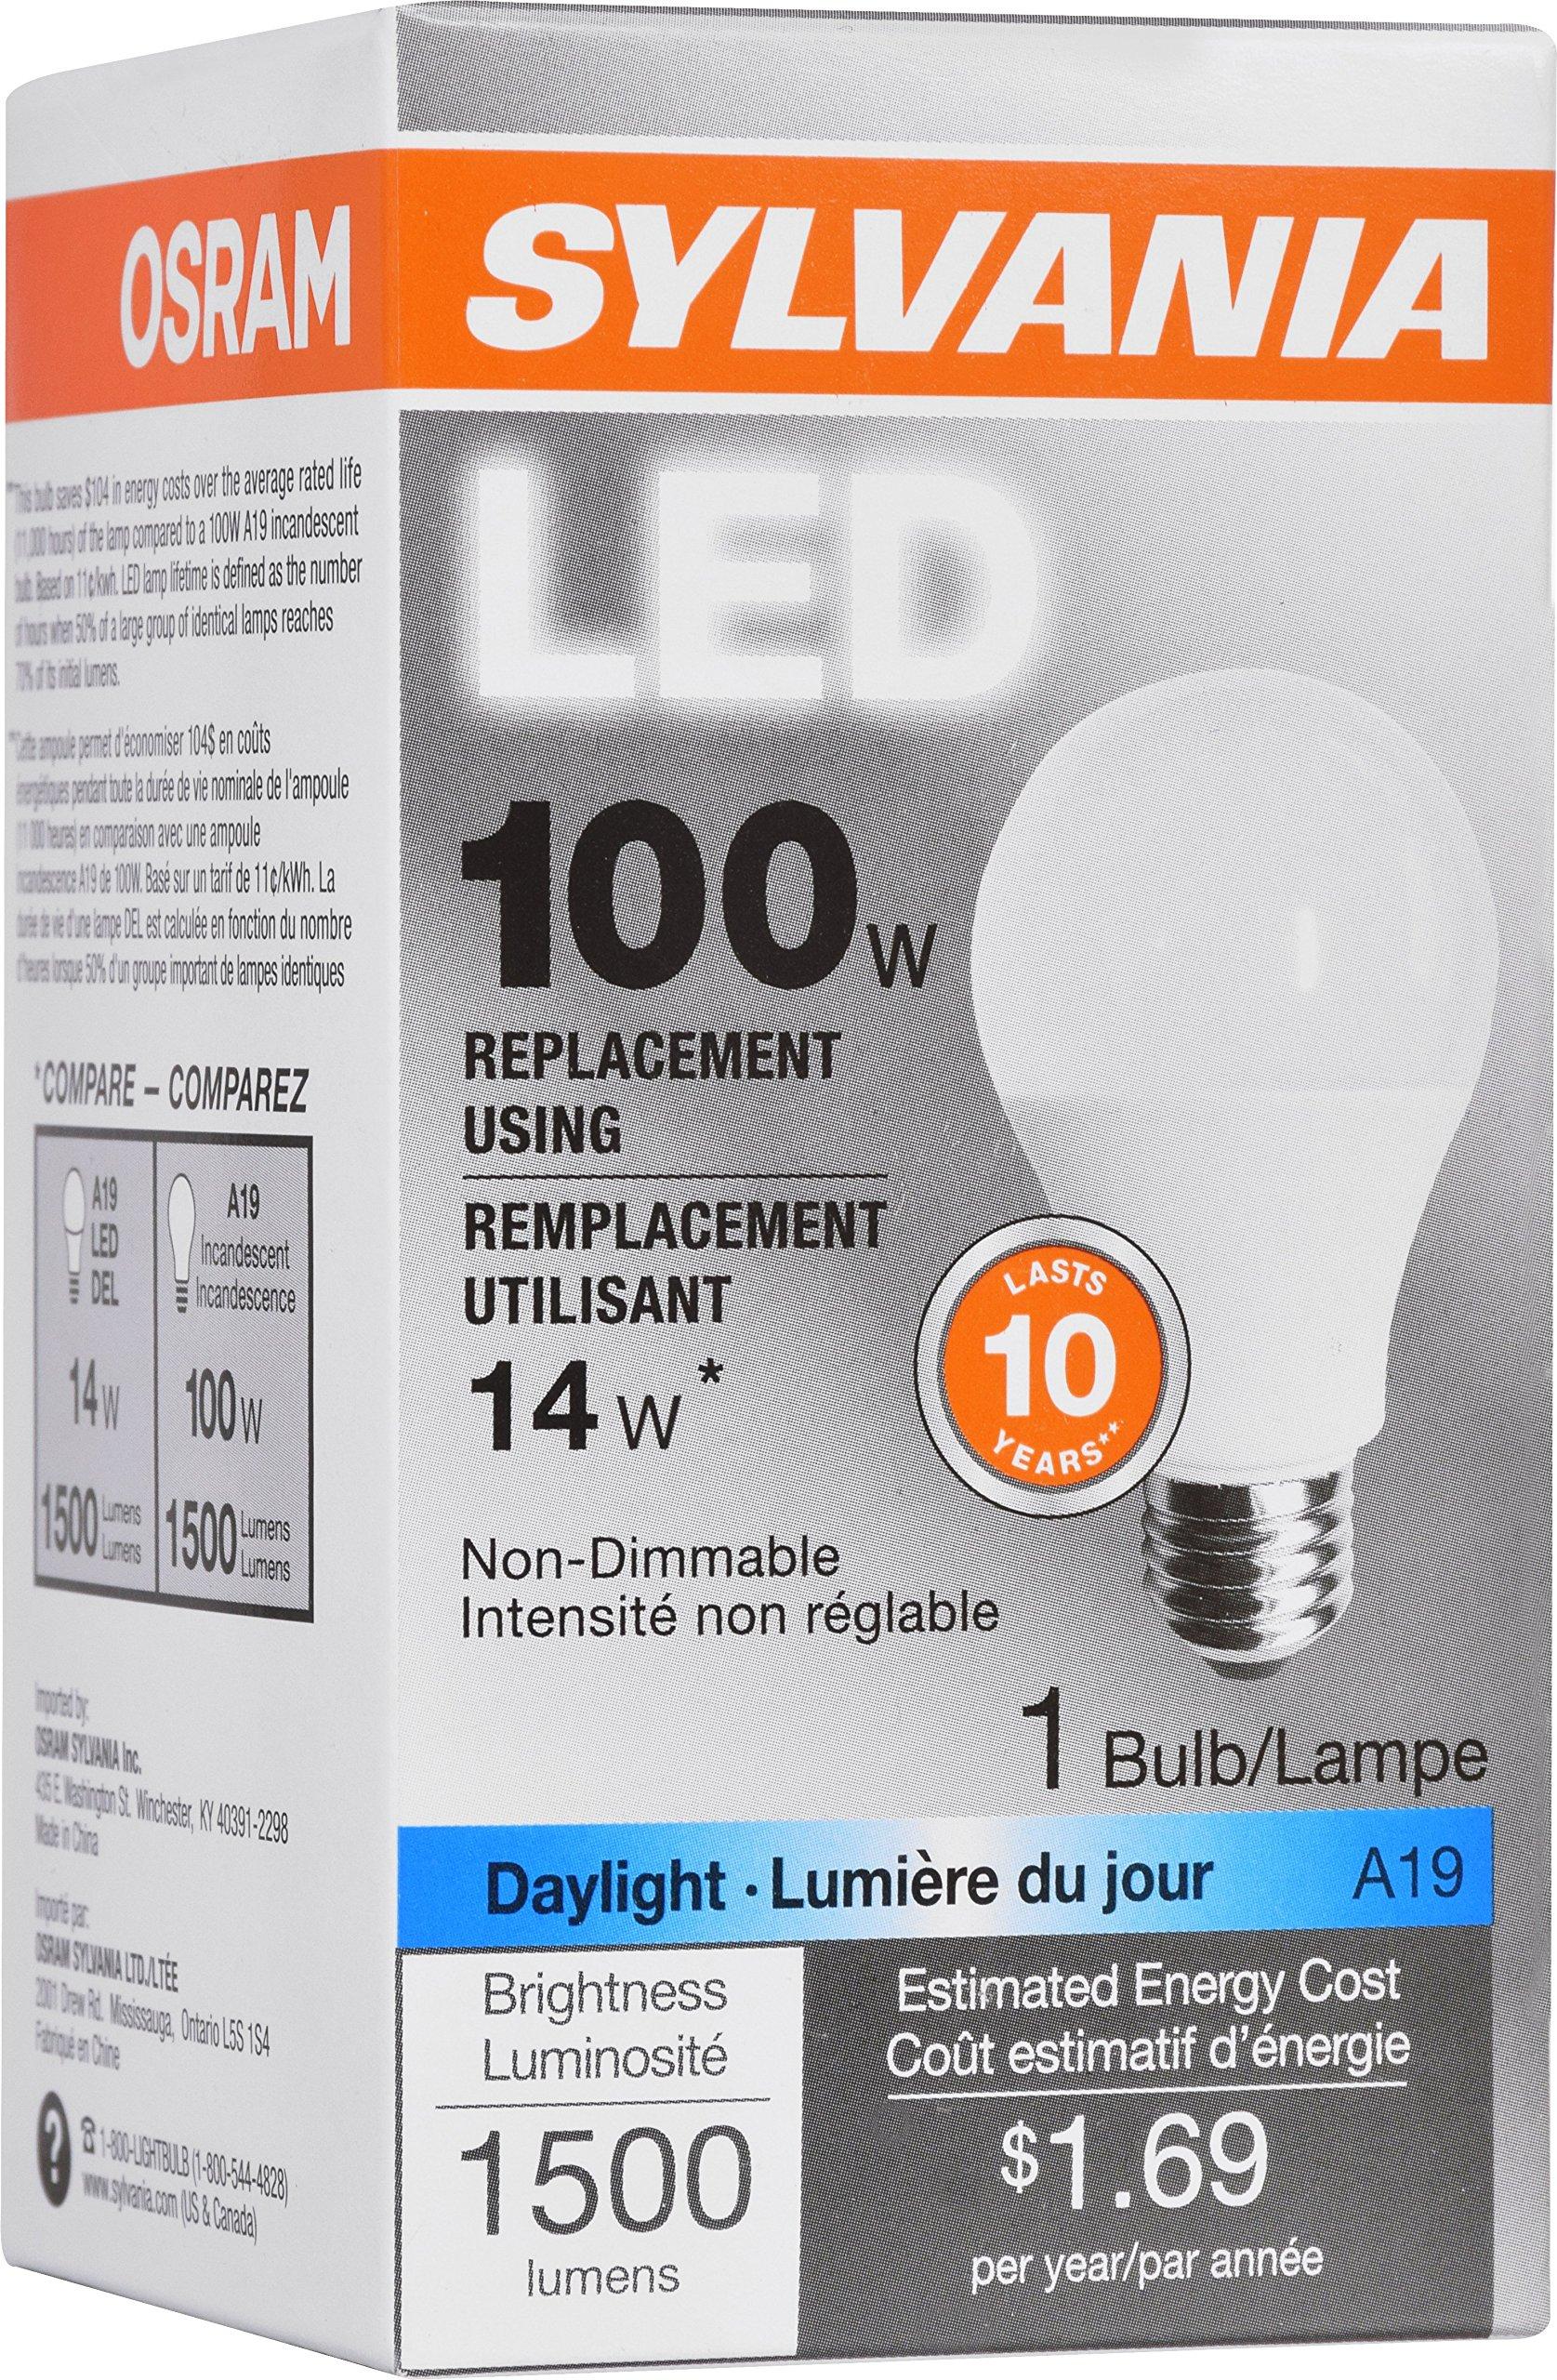 Led Daylight Bulb: SYLVANIA, 100W Equivalent, LED Light Bulb, A19 Lamp, 1